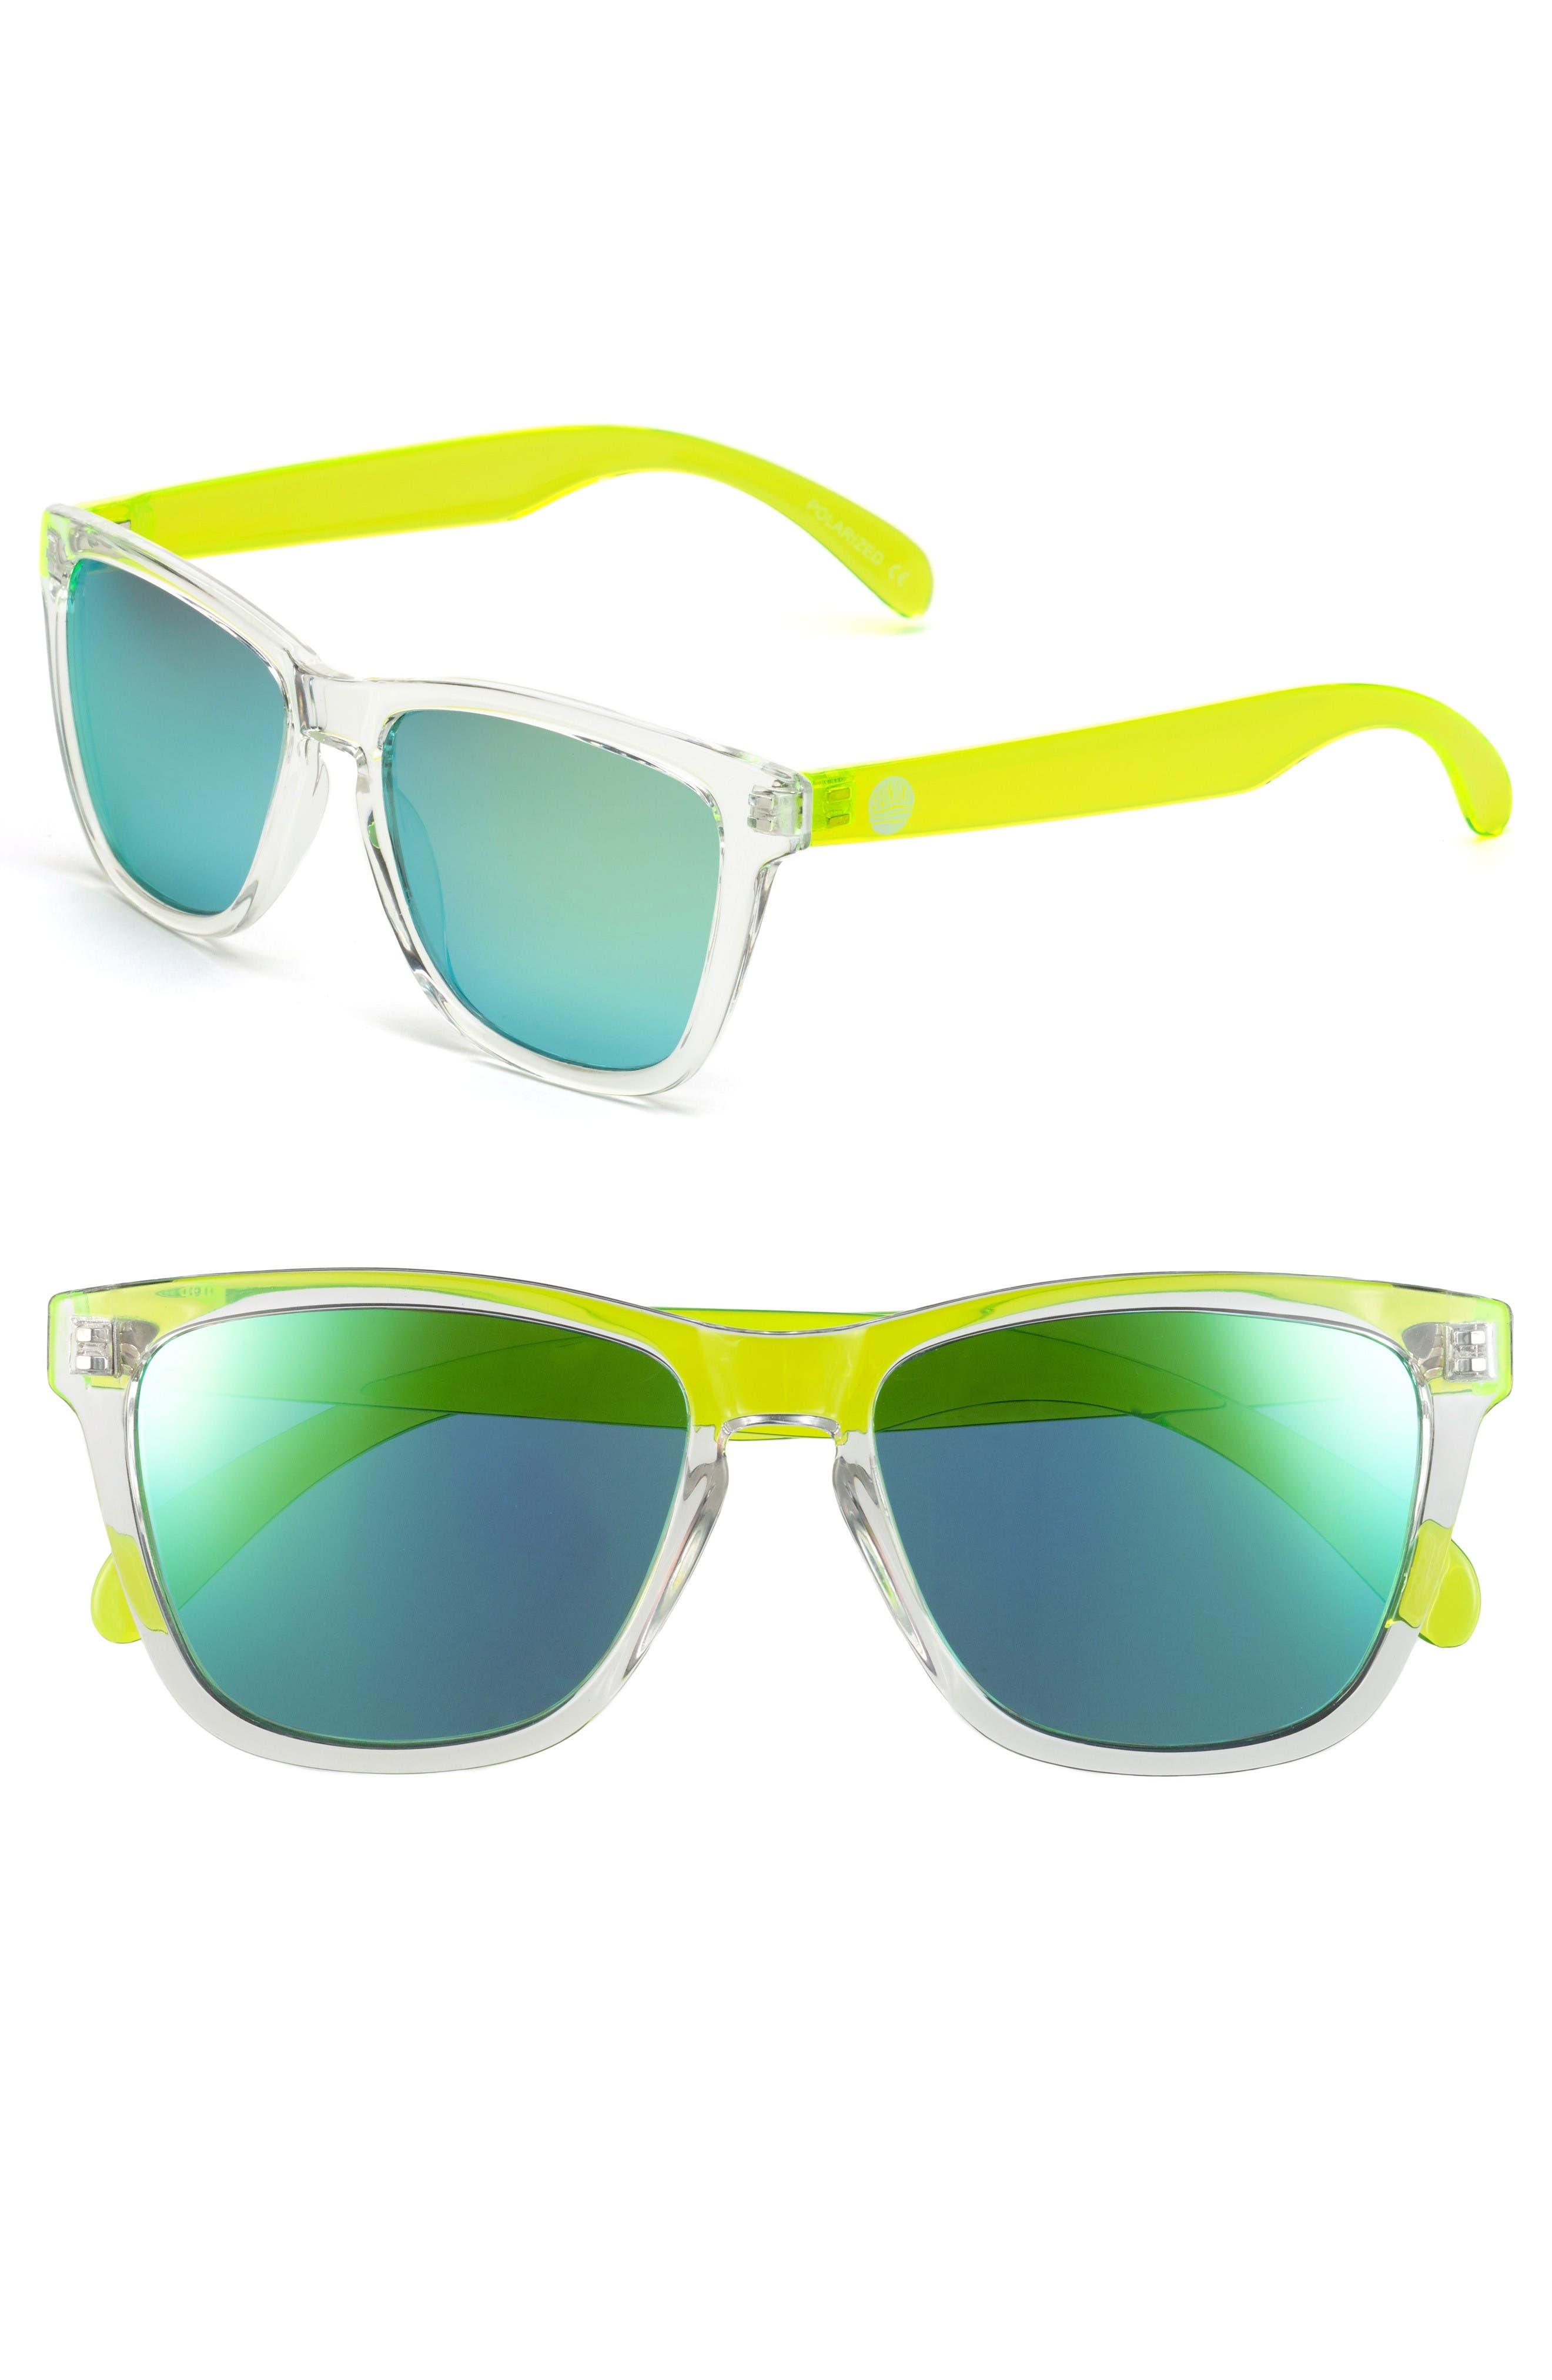 Main Image - Sunski Original 53mm Polarized Sunglasses